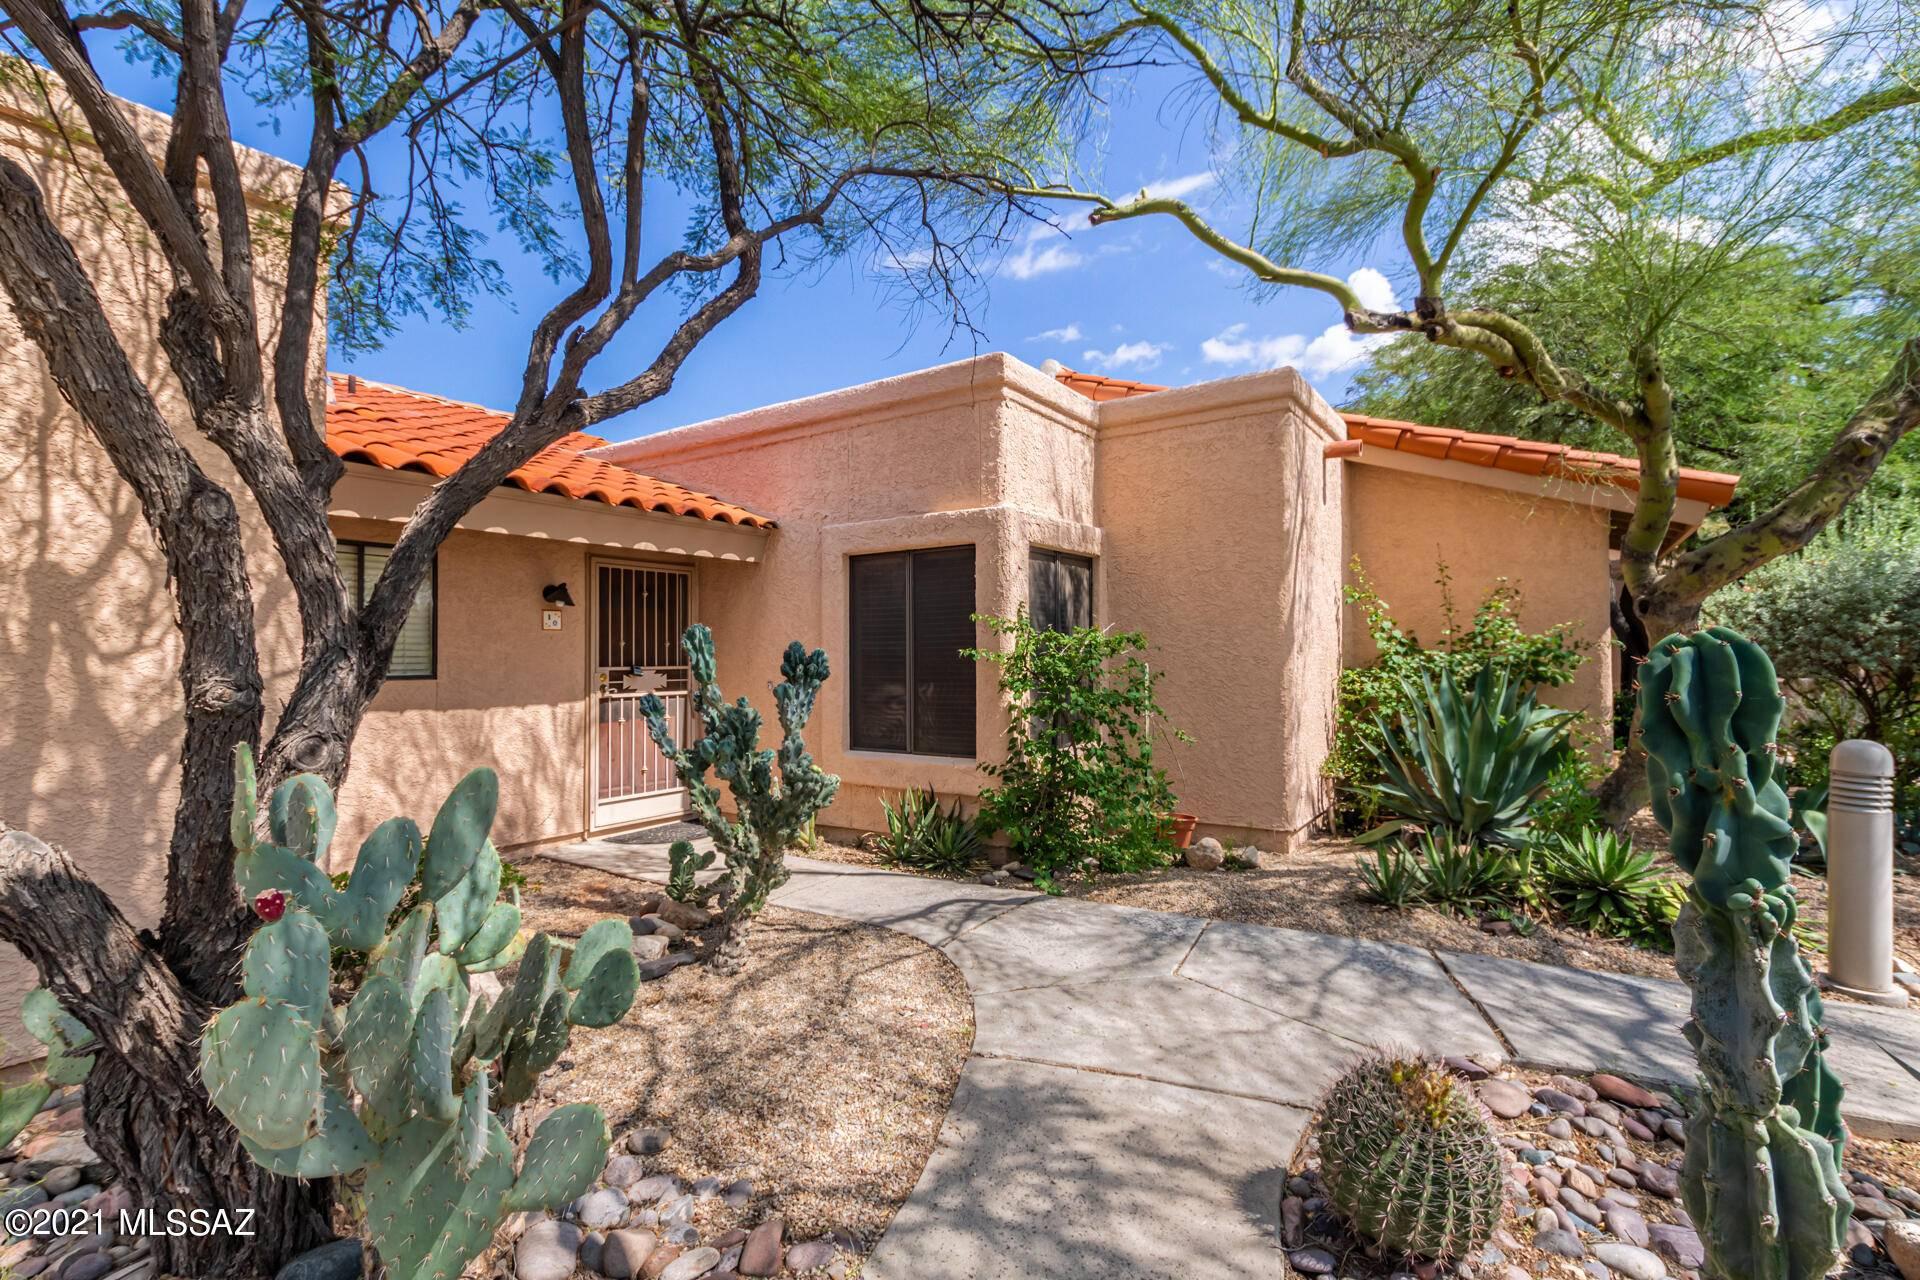 7601 N Calle Sin Envidia  #10, Tucson, AZ 85718 – 22125326 - Team I...